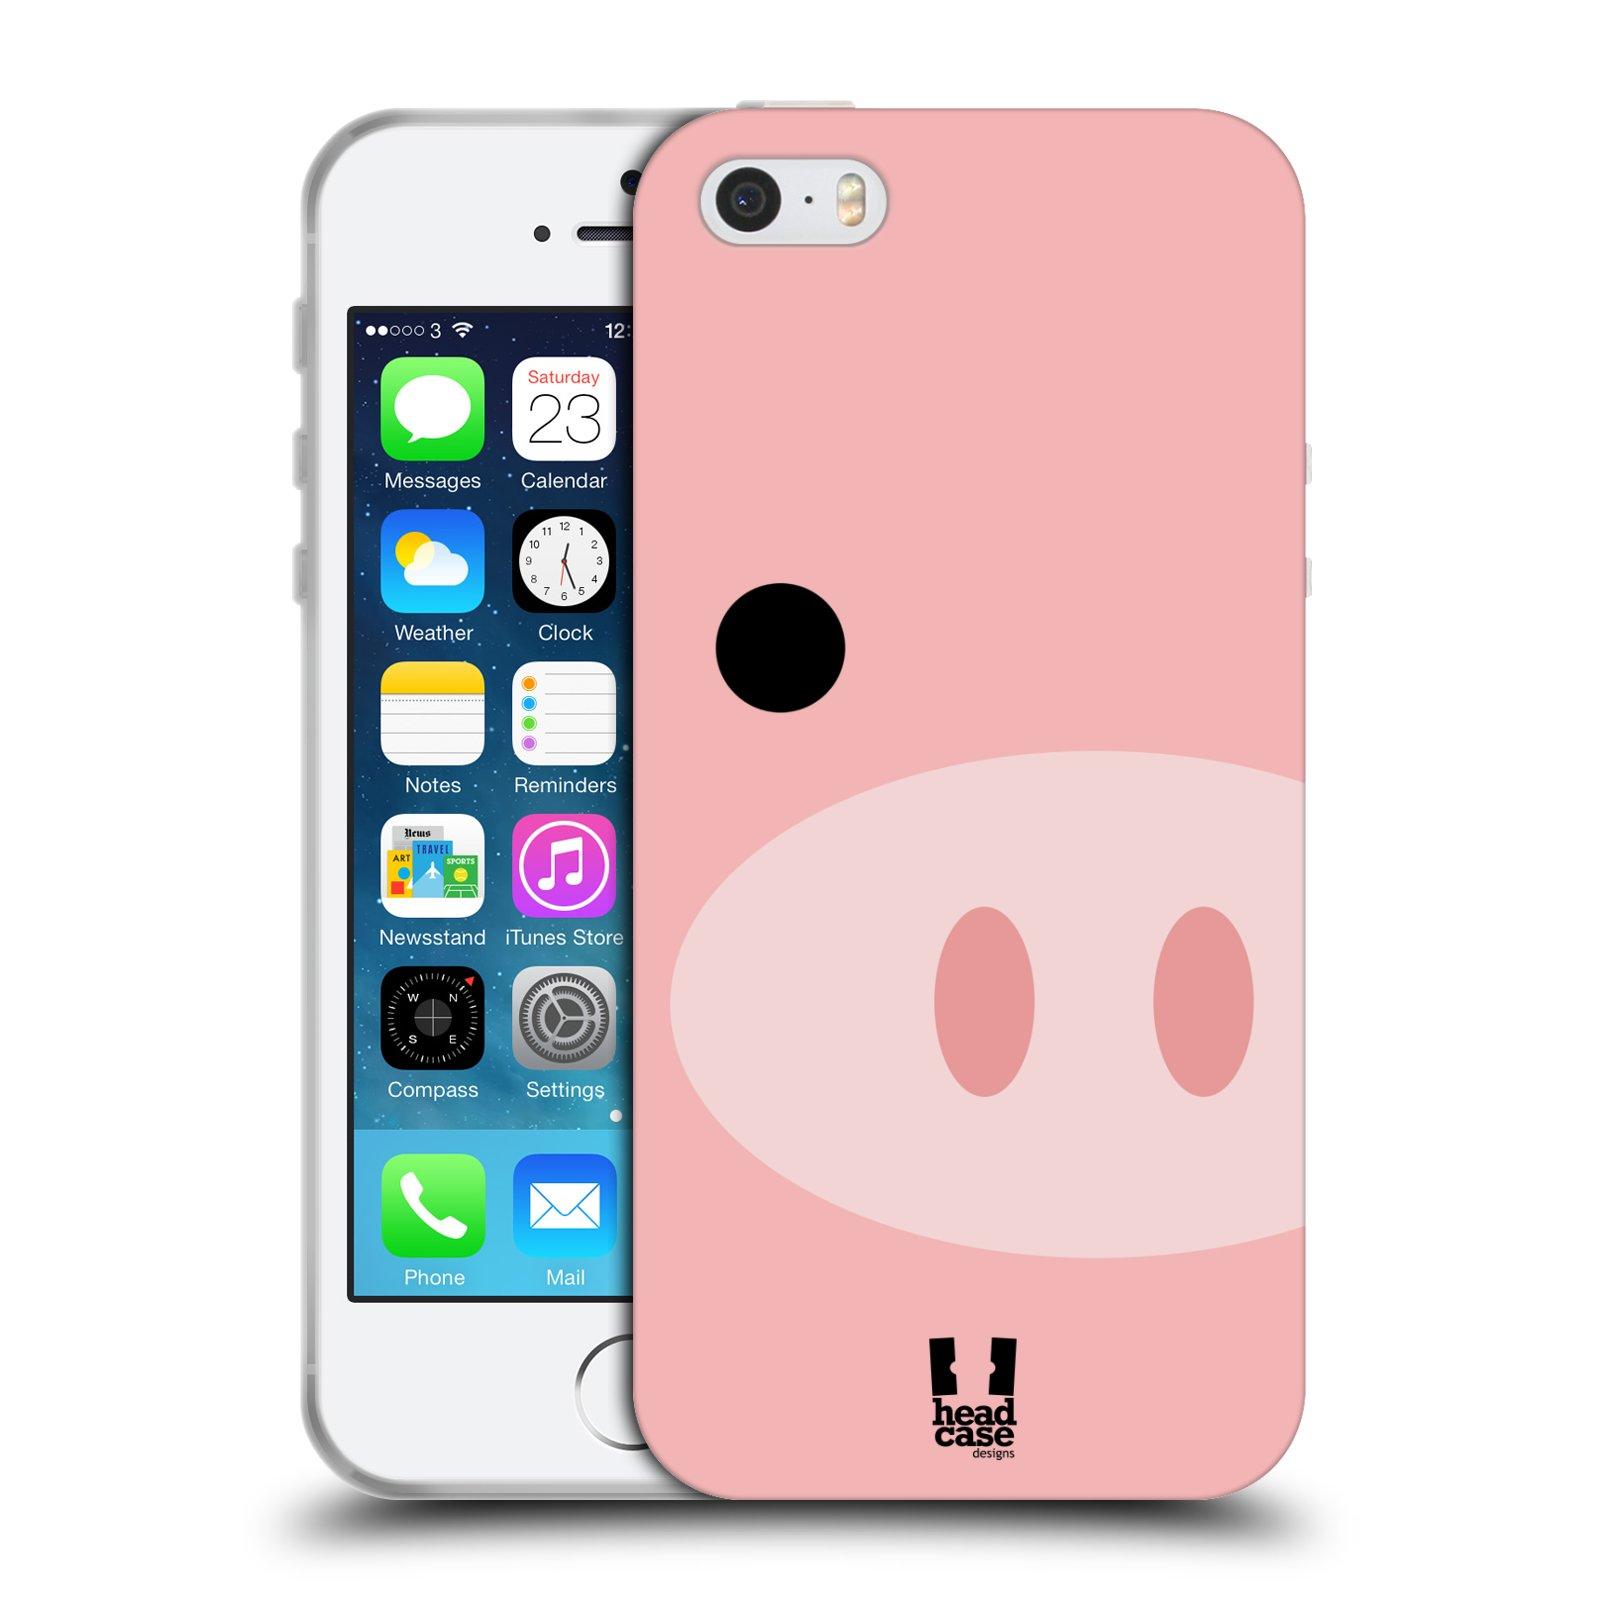 HEAD CASE silikonový obal na mobil Apple Iphone 5/5S vzor Celá tvář zvíře kreslený portrét prasátko